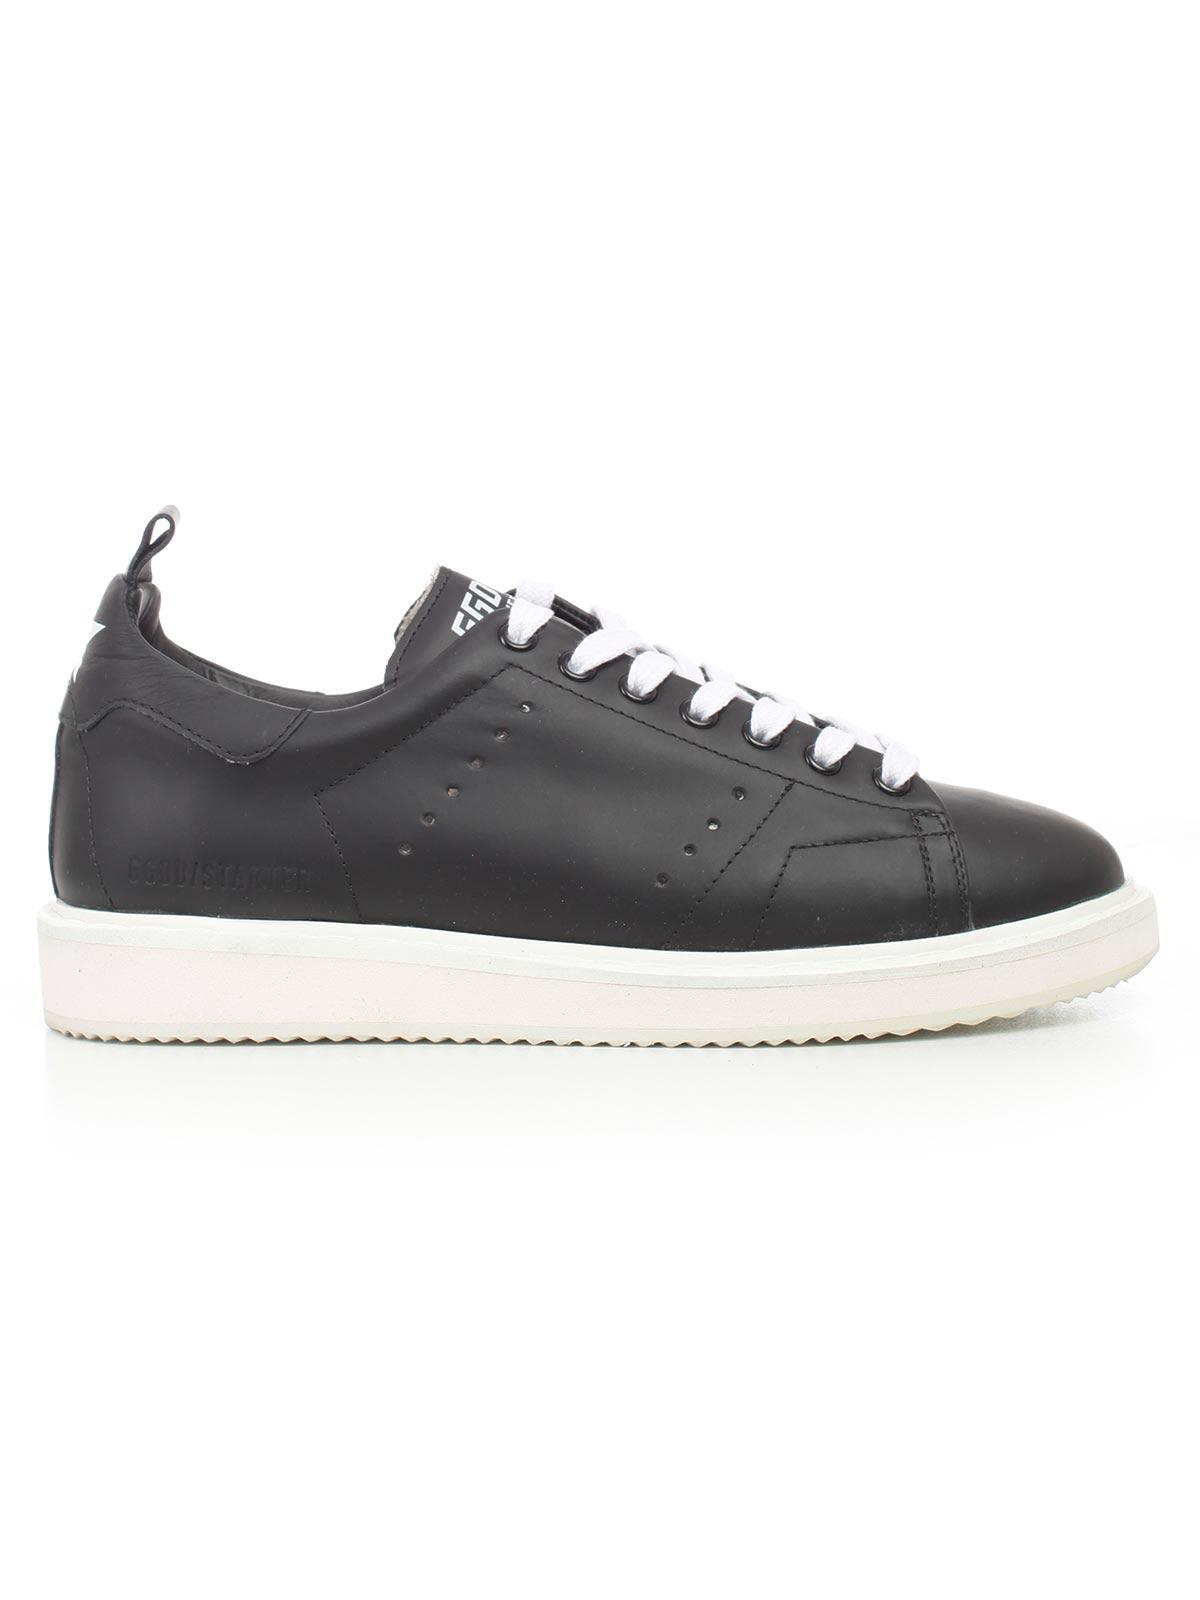 Sneakers Starter in Black White Sole